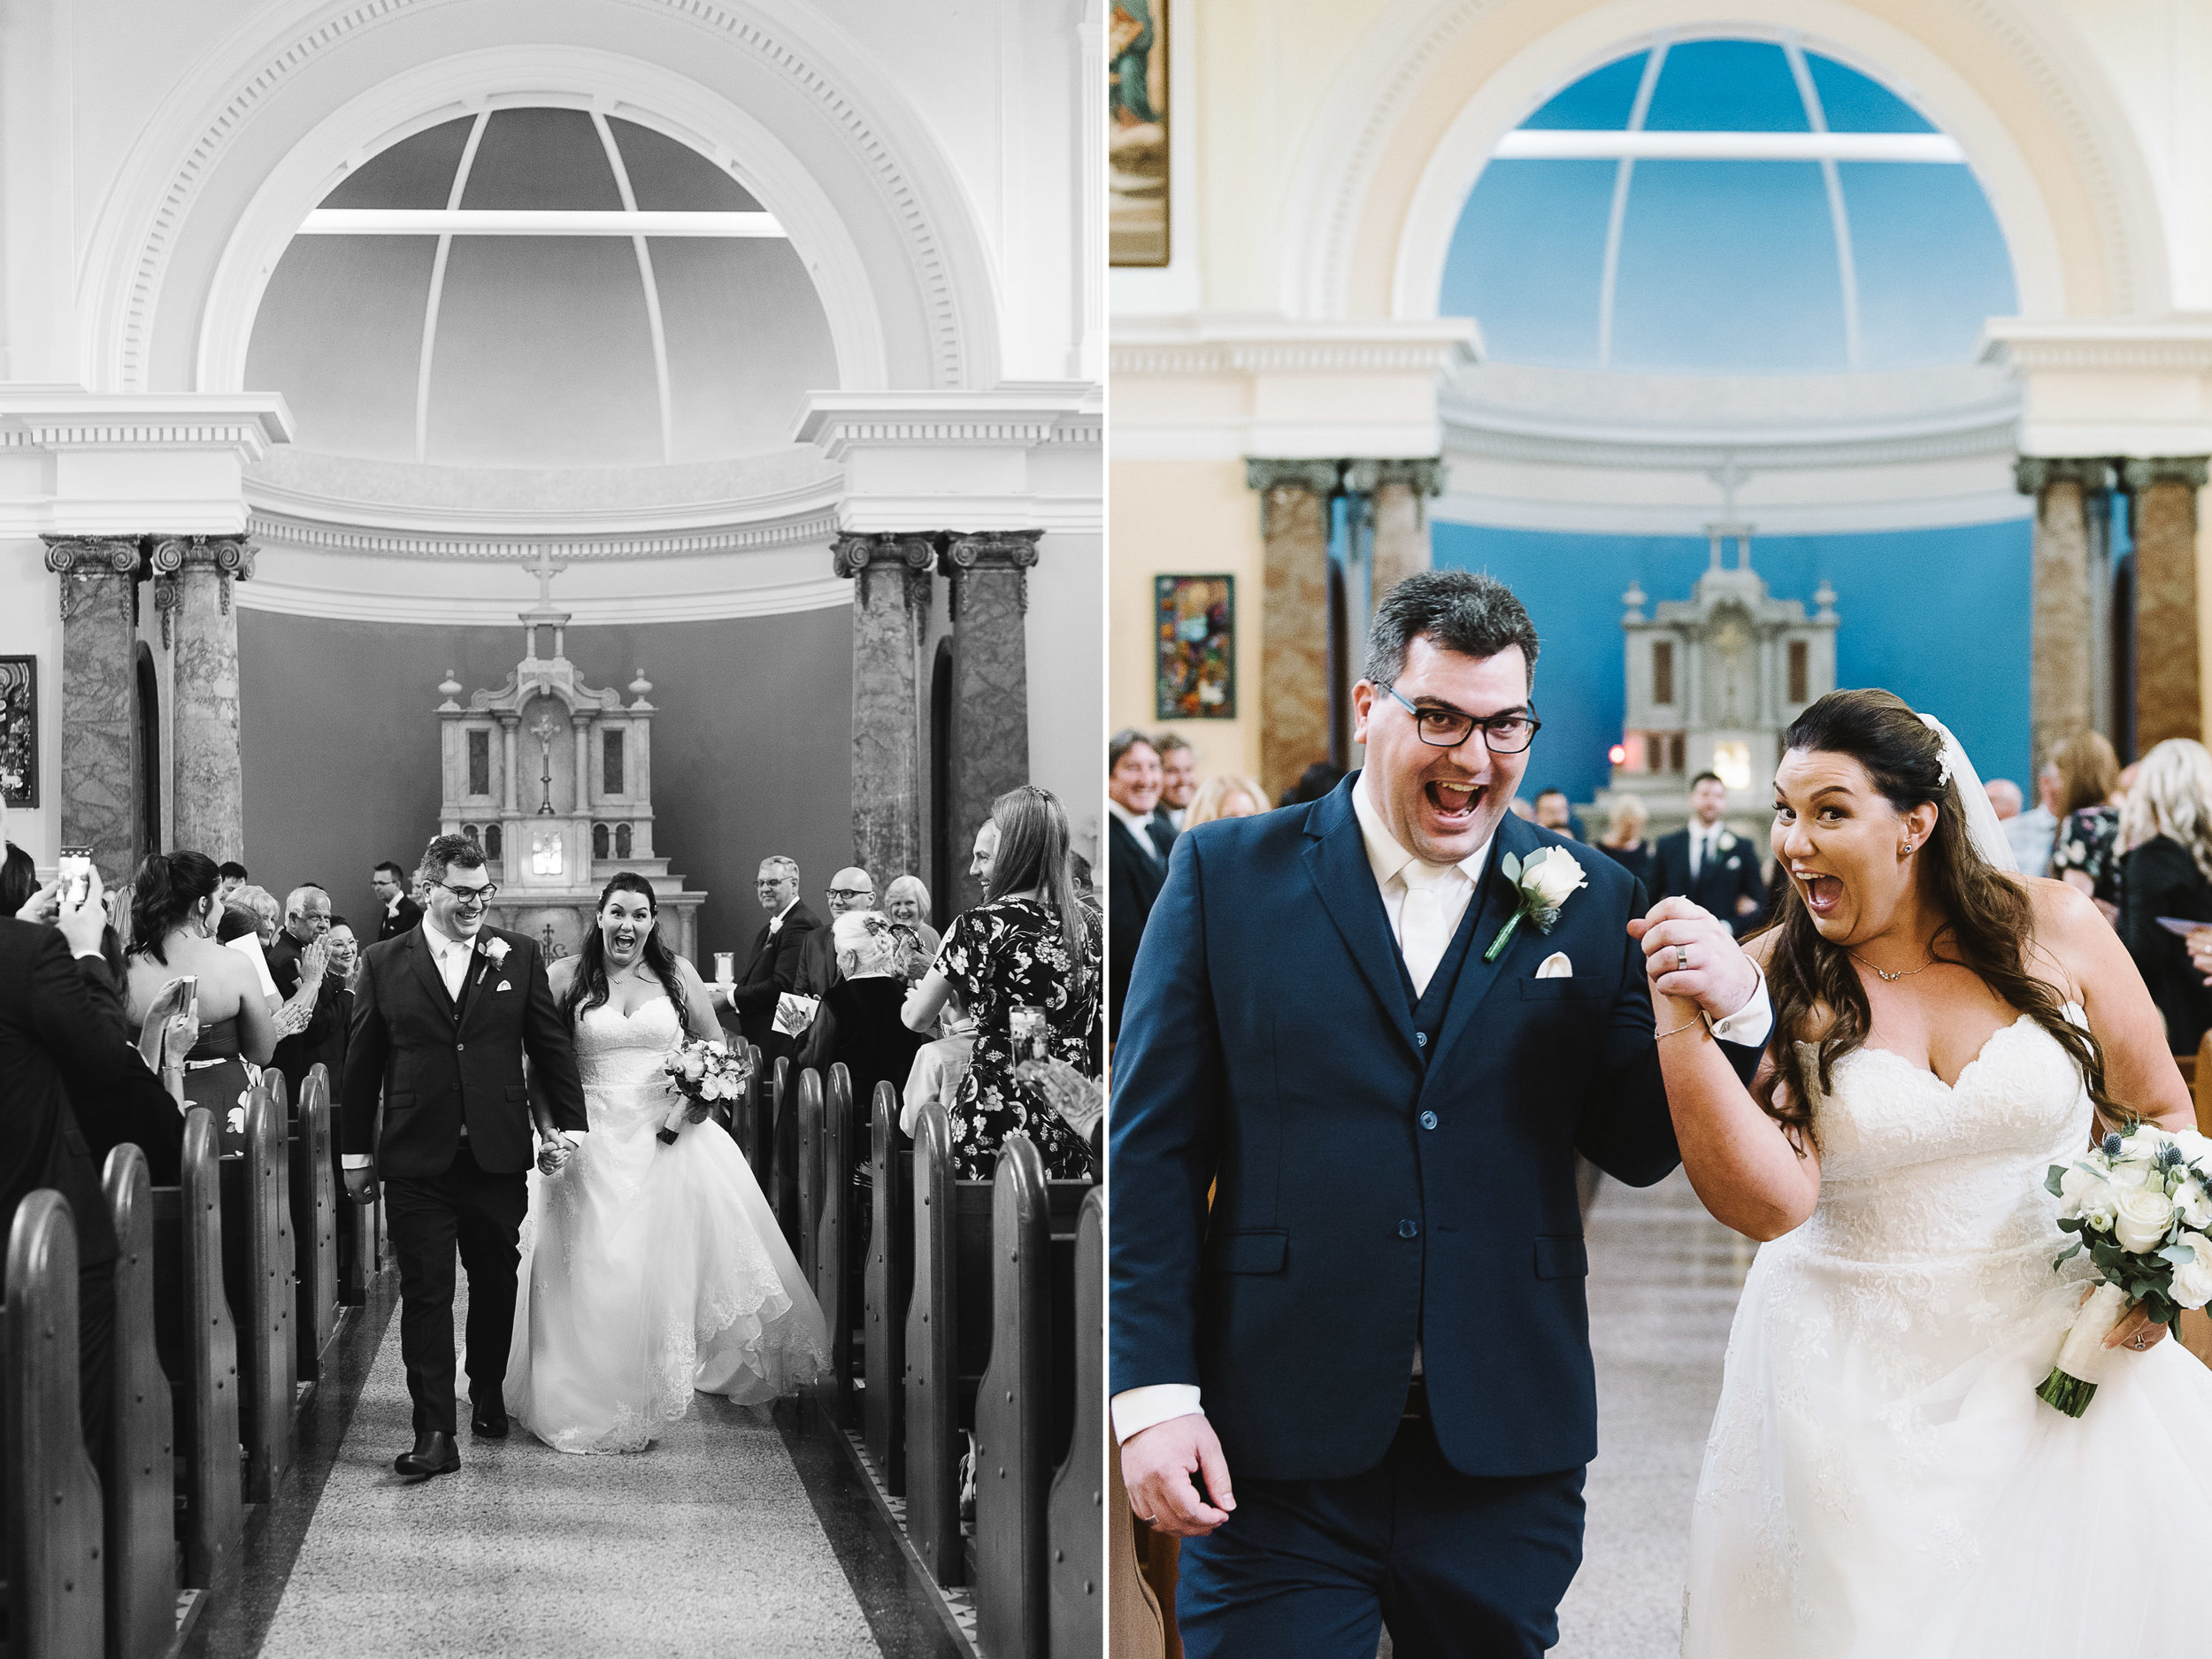 nudgee-college-wedding-25.jpg